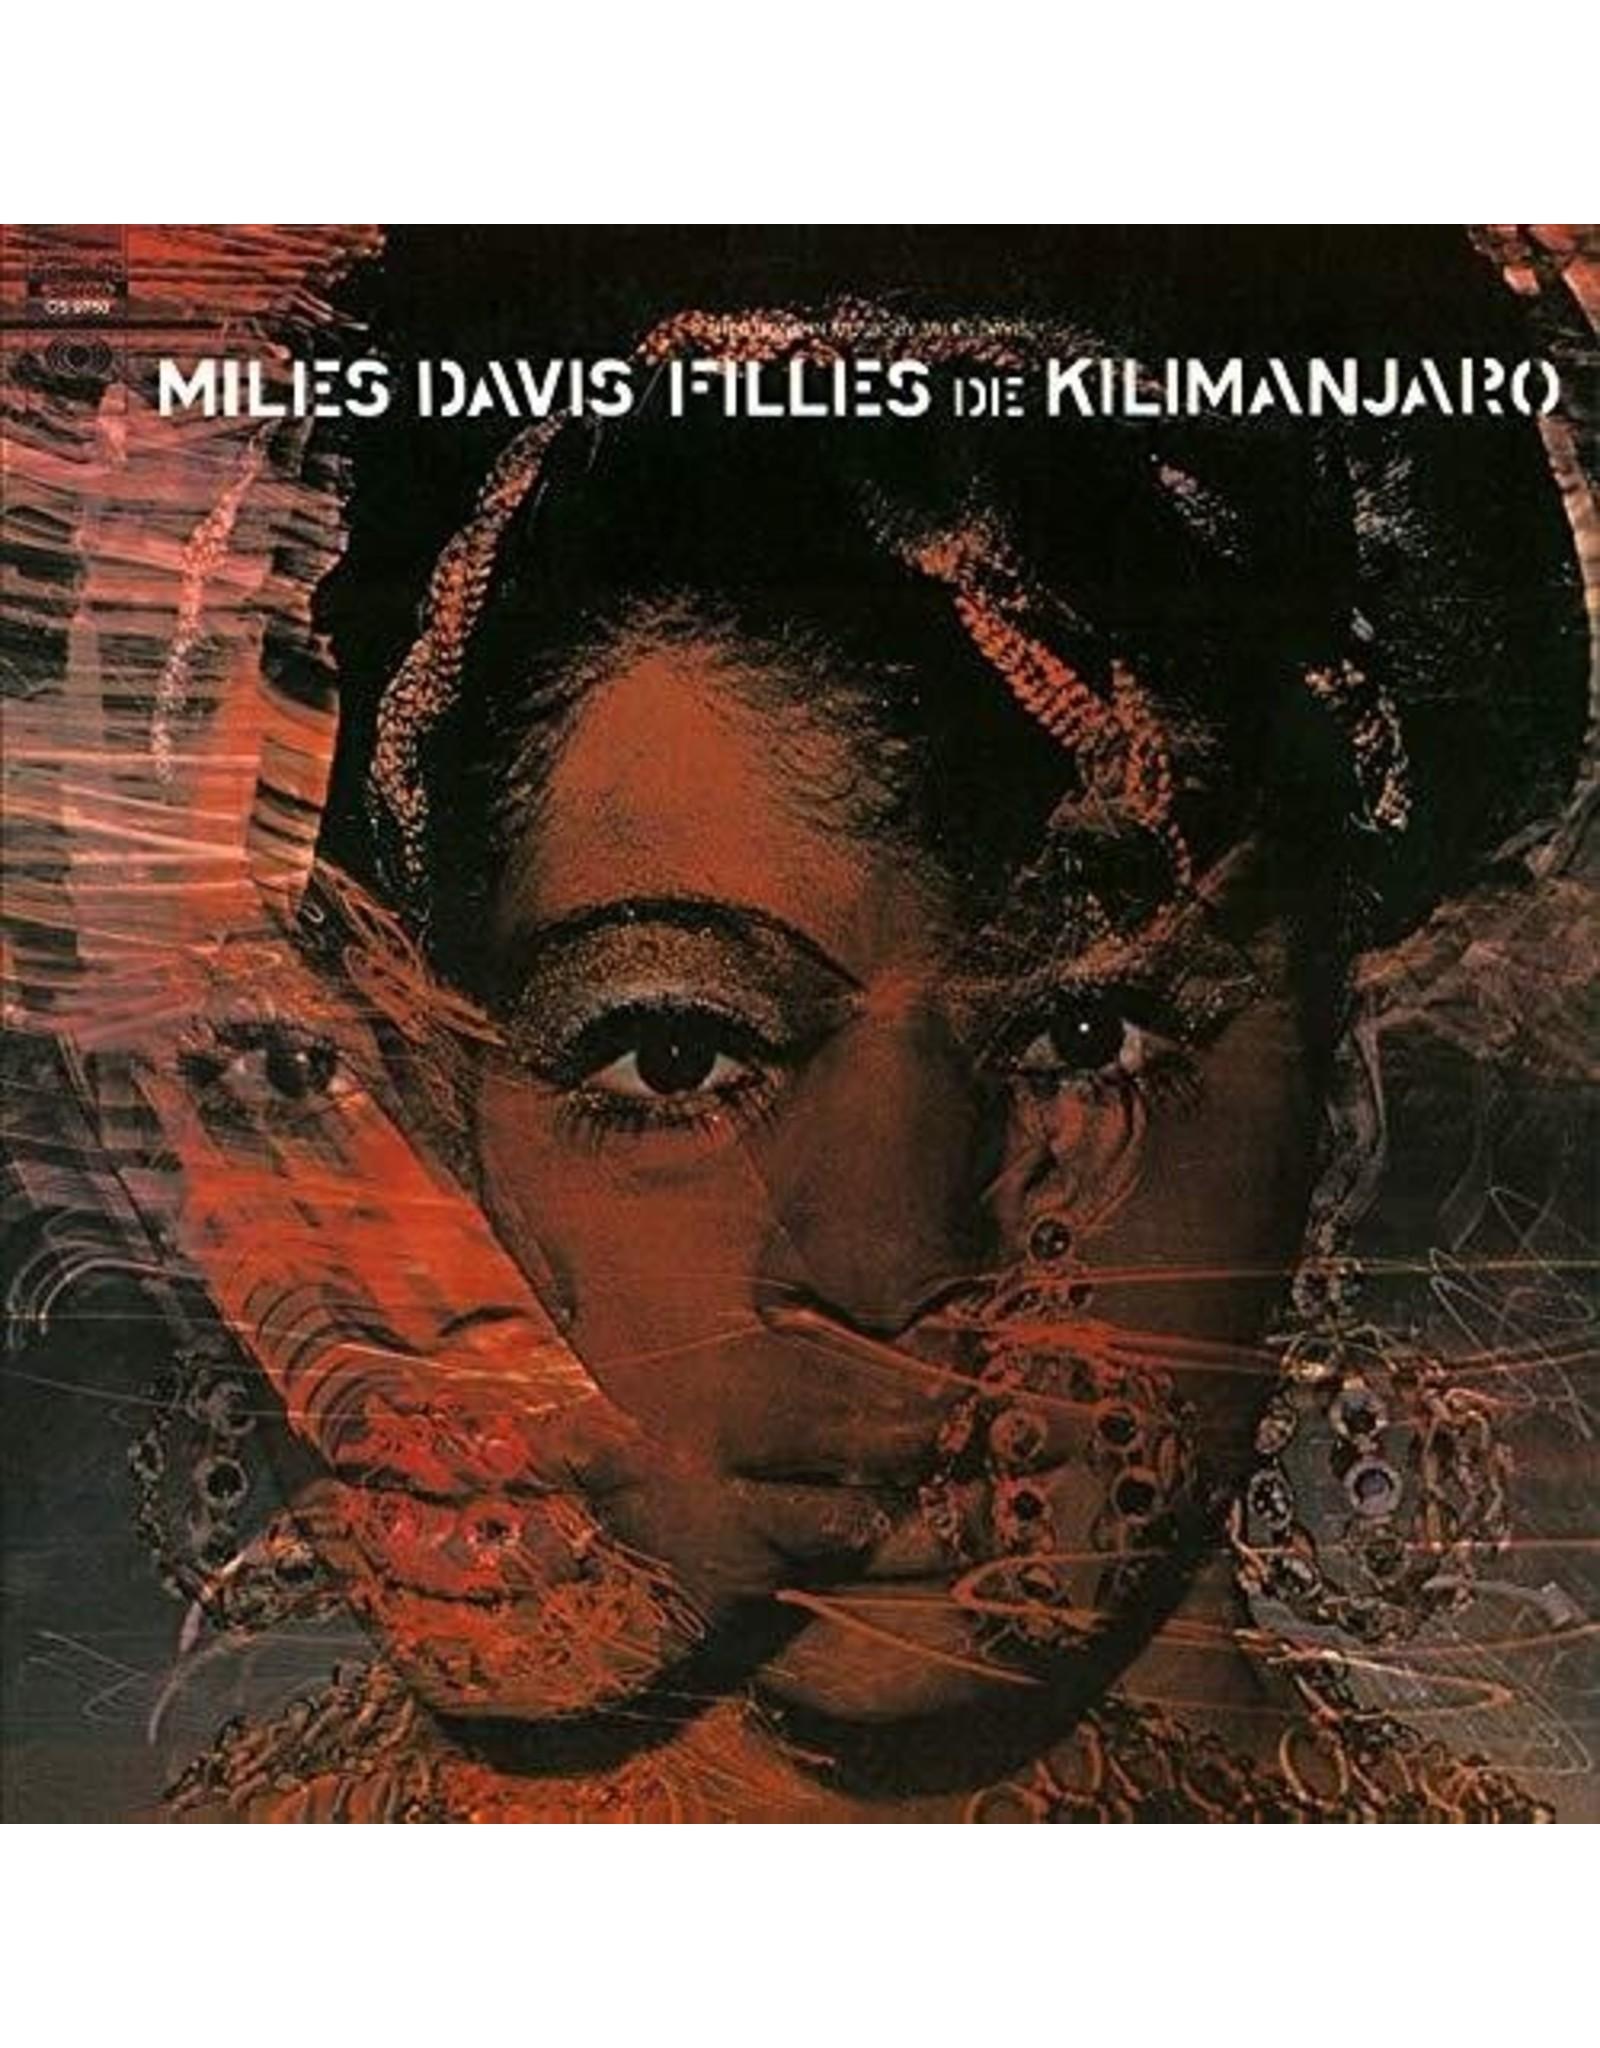 New Vinyl Miles Davis - Filles De Kilimanjaro LP